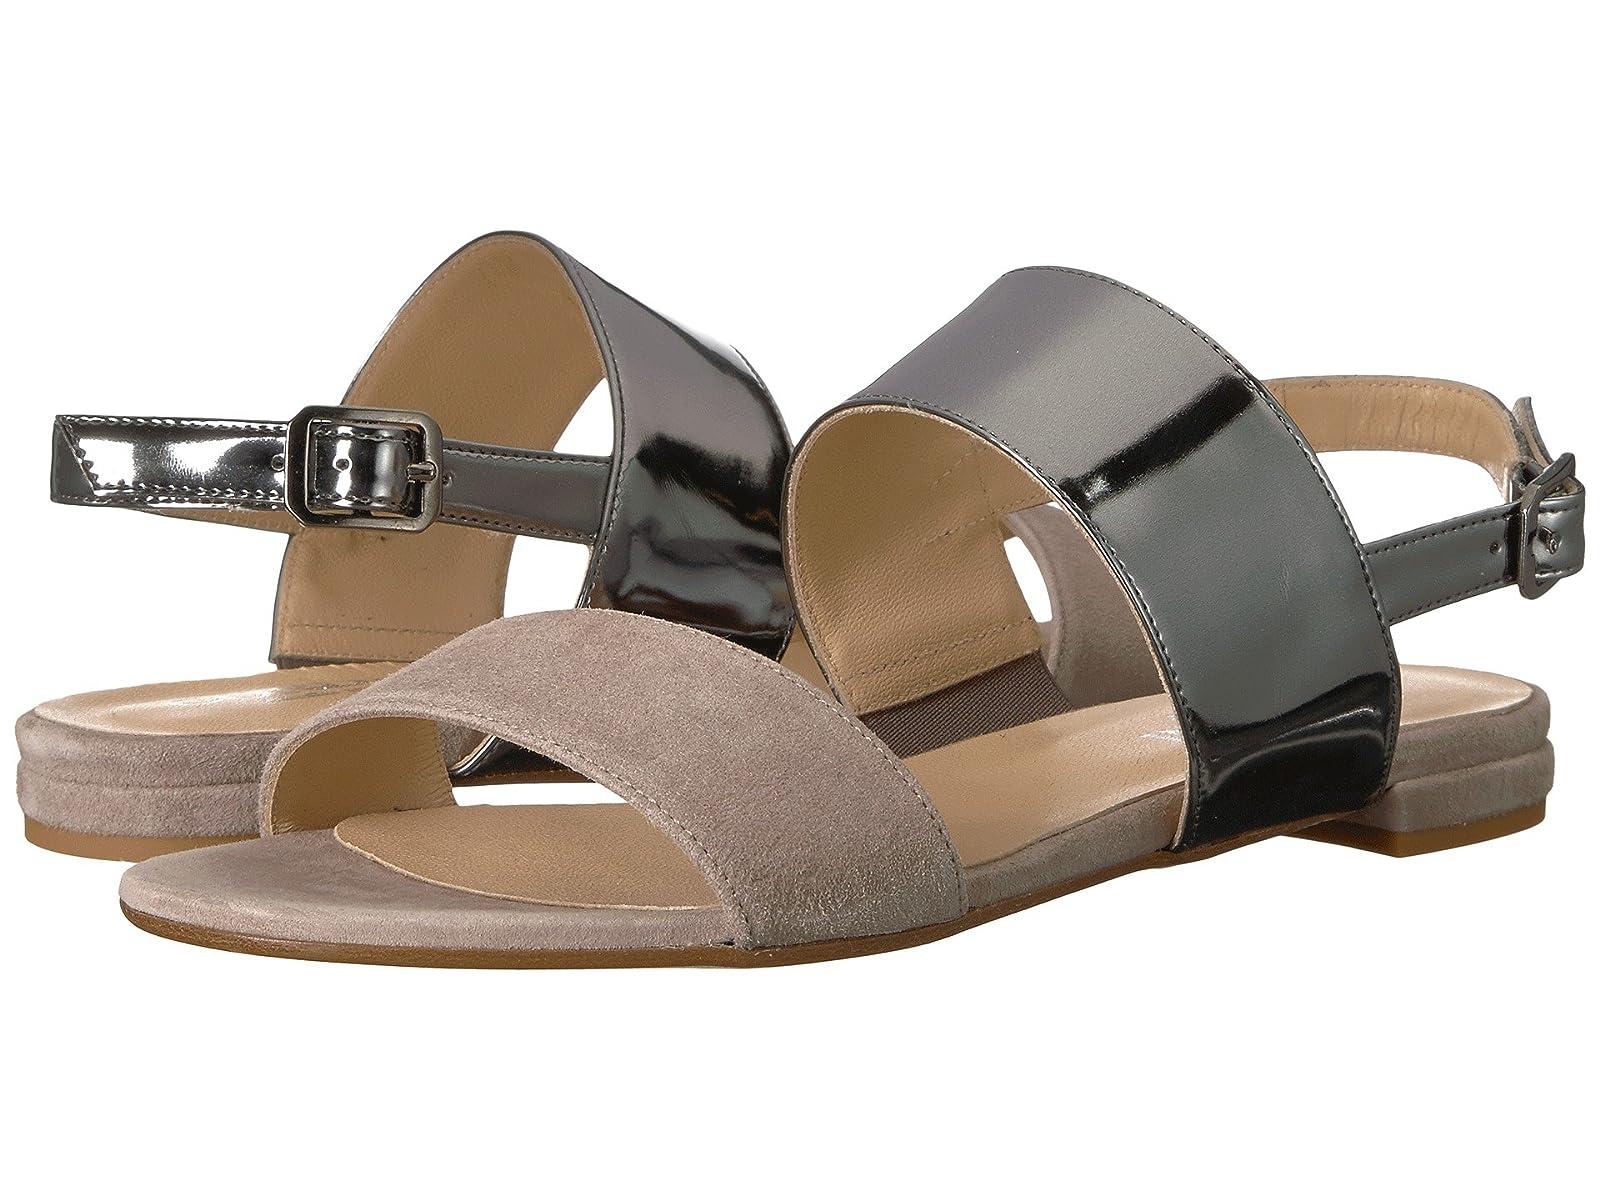 Cordani PrudenceCheap and distinctive eye-catching shoes